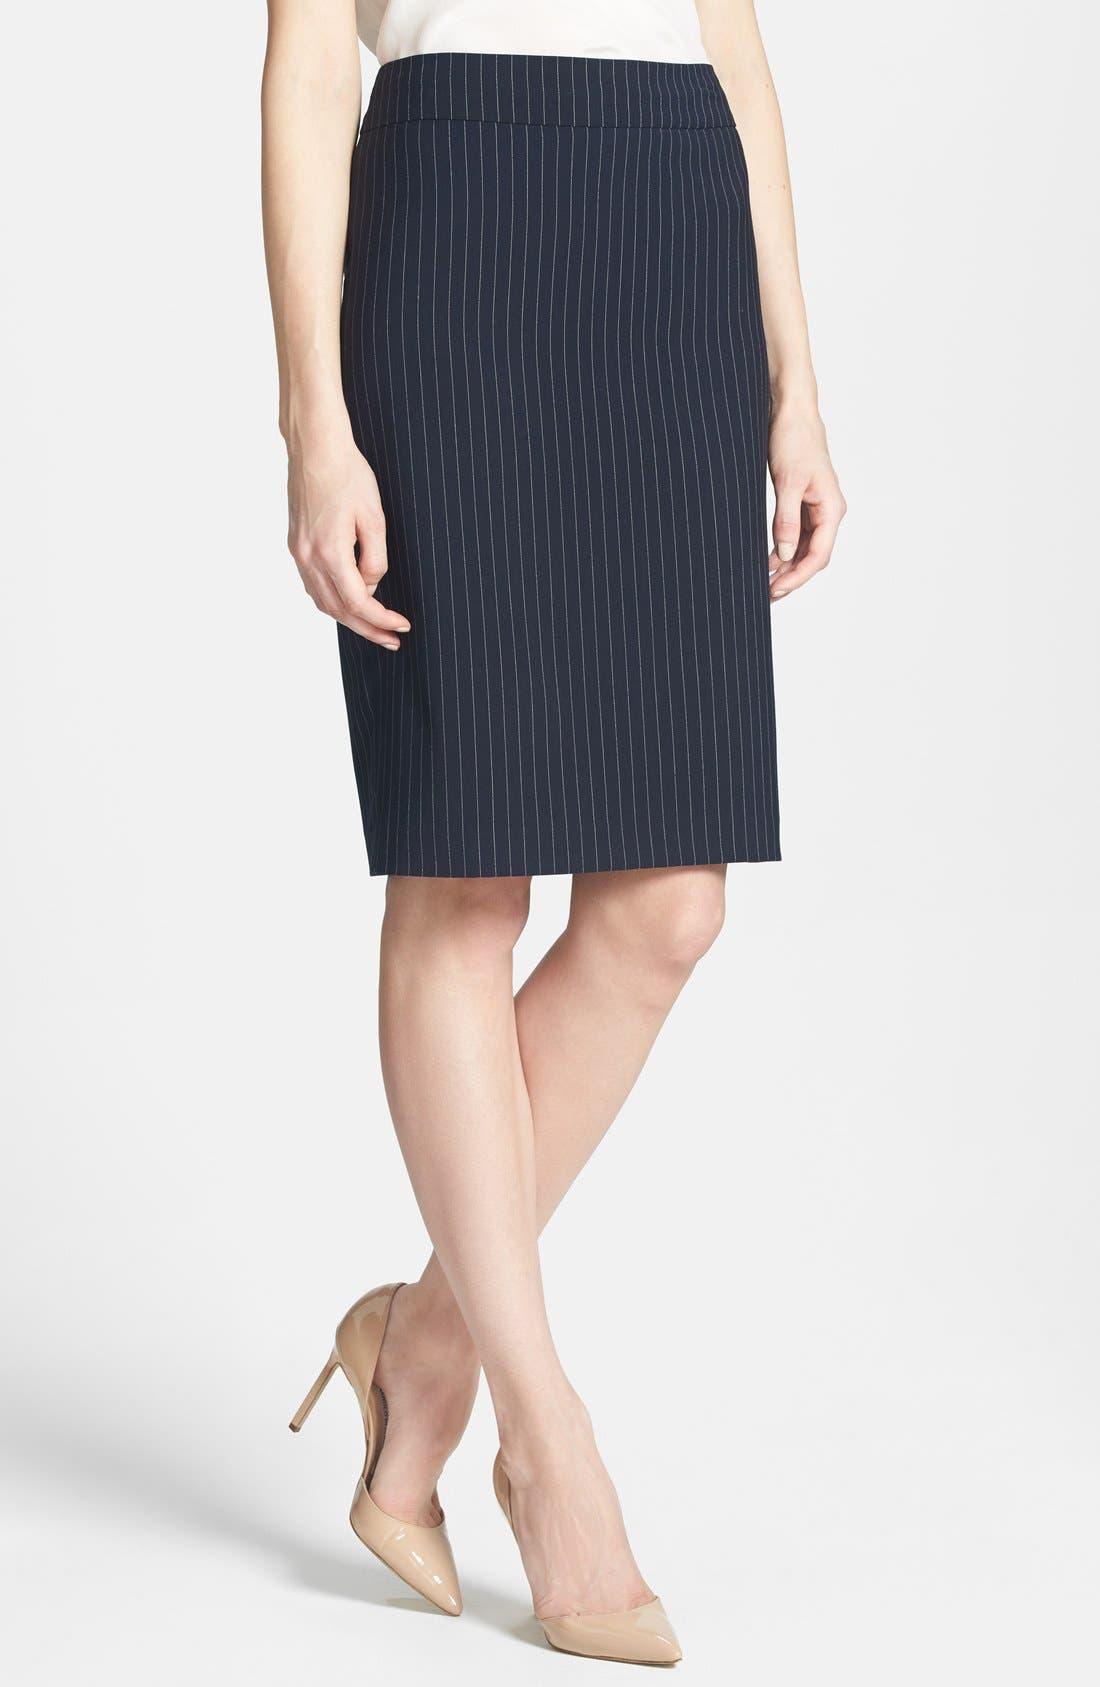 Alternate Image 1 Selected - Jones New York 'Lucy' Pencil Skirt